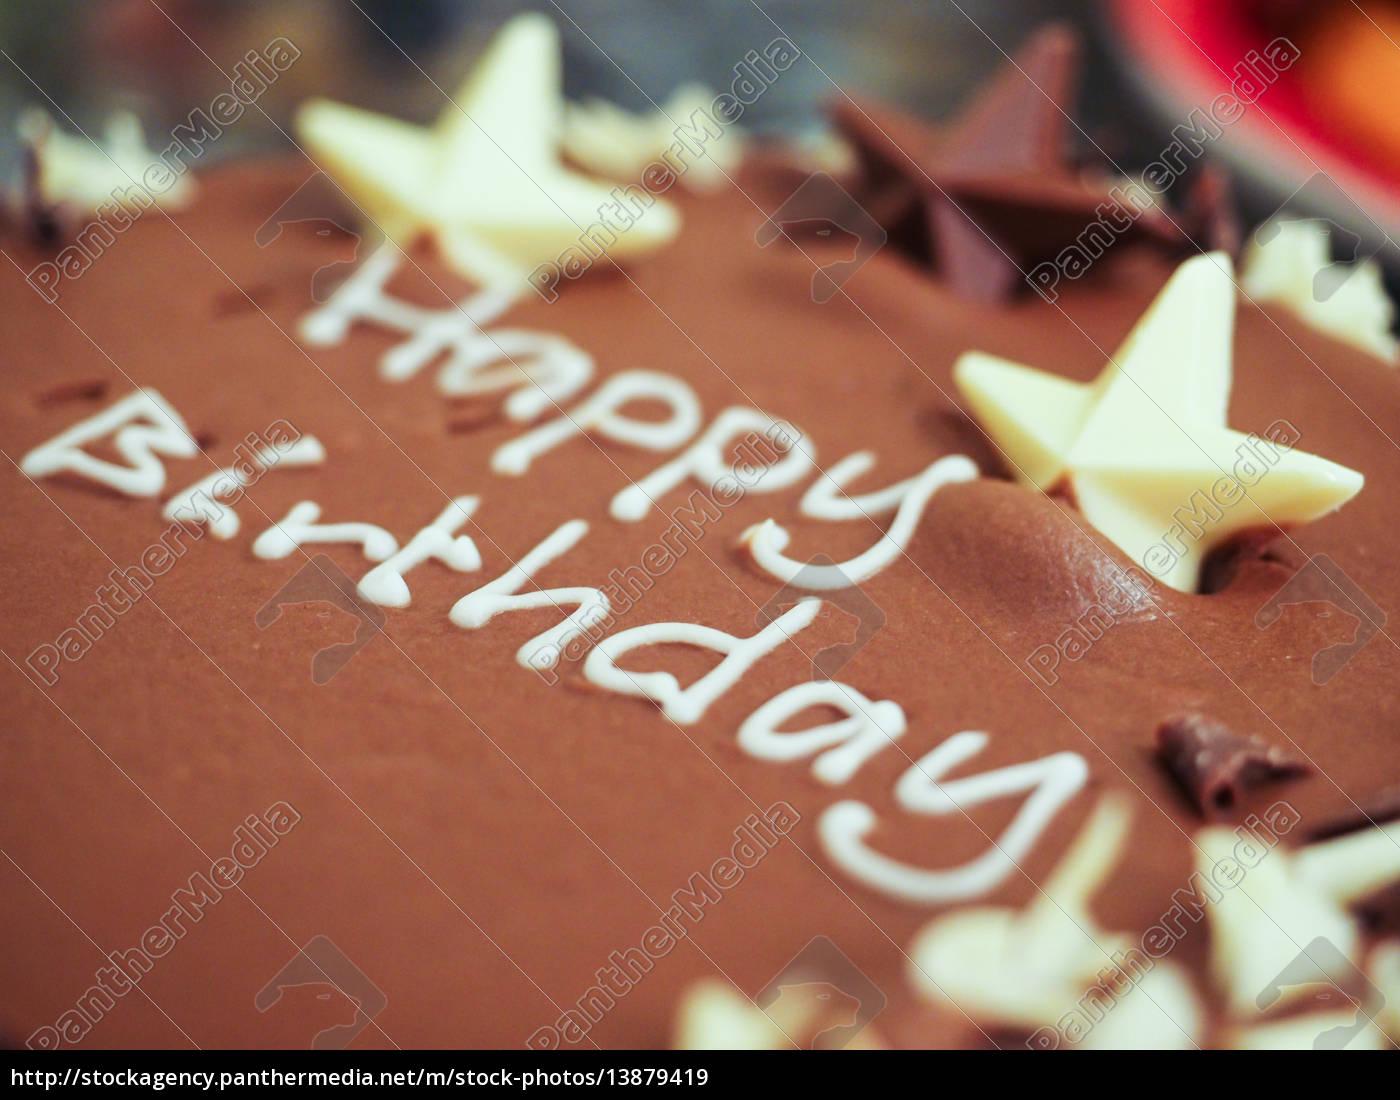 Astonishing Happy Birthday Chocolate Cake Royalty Free Image 13879419 Birthday Cards Printable Opercafe Filternl